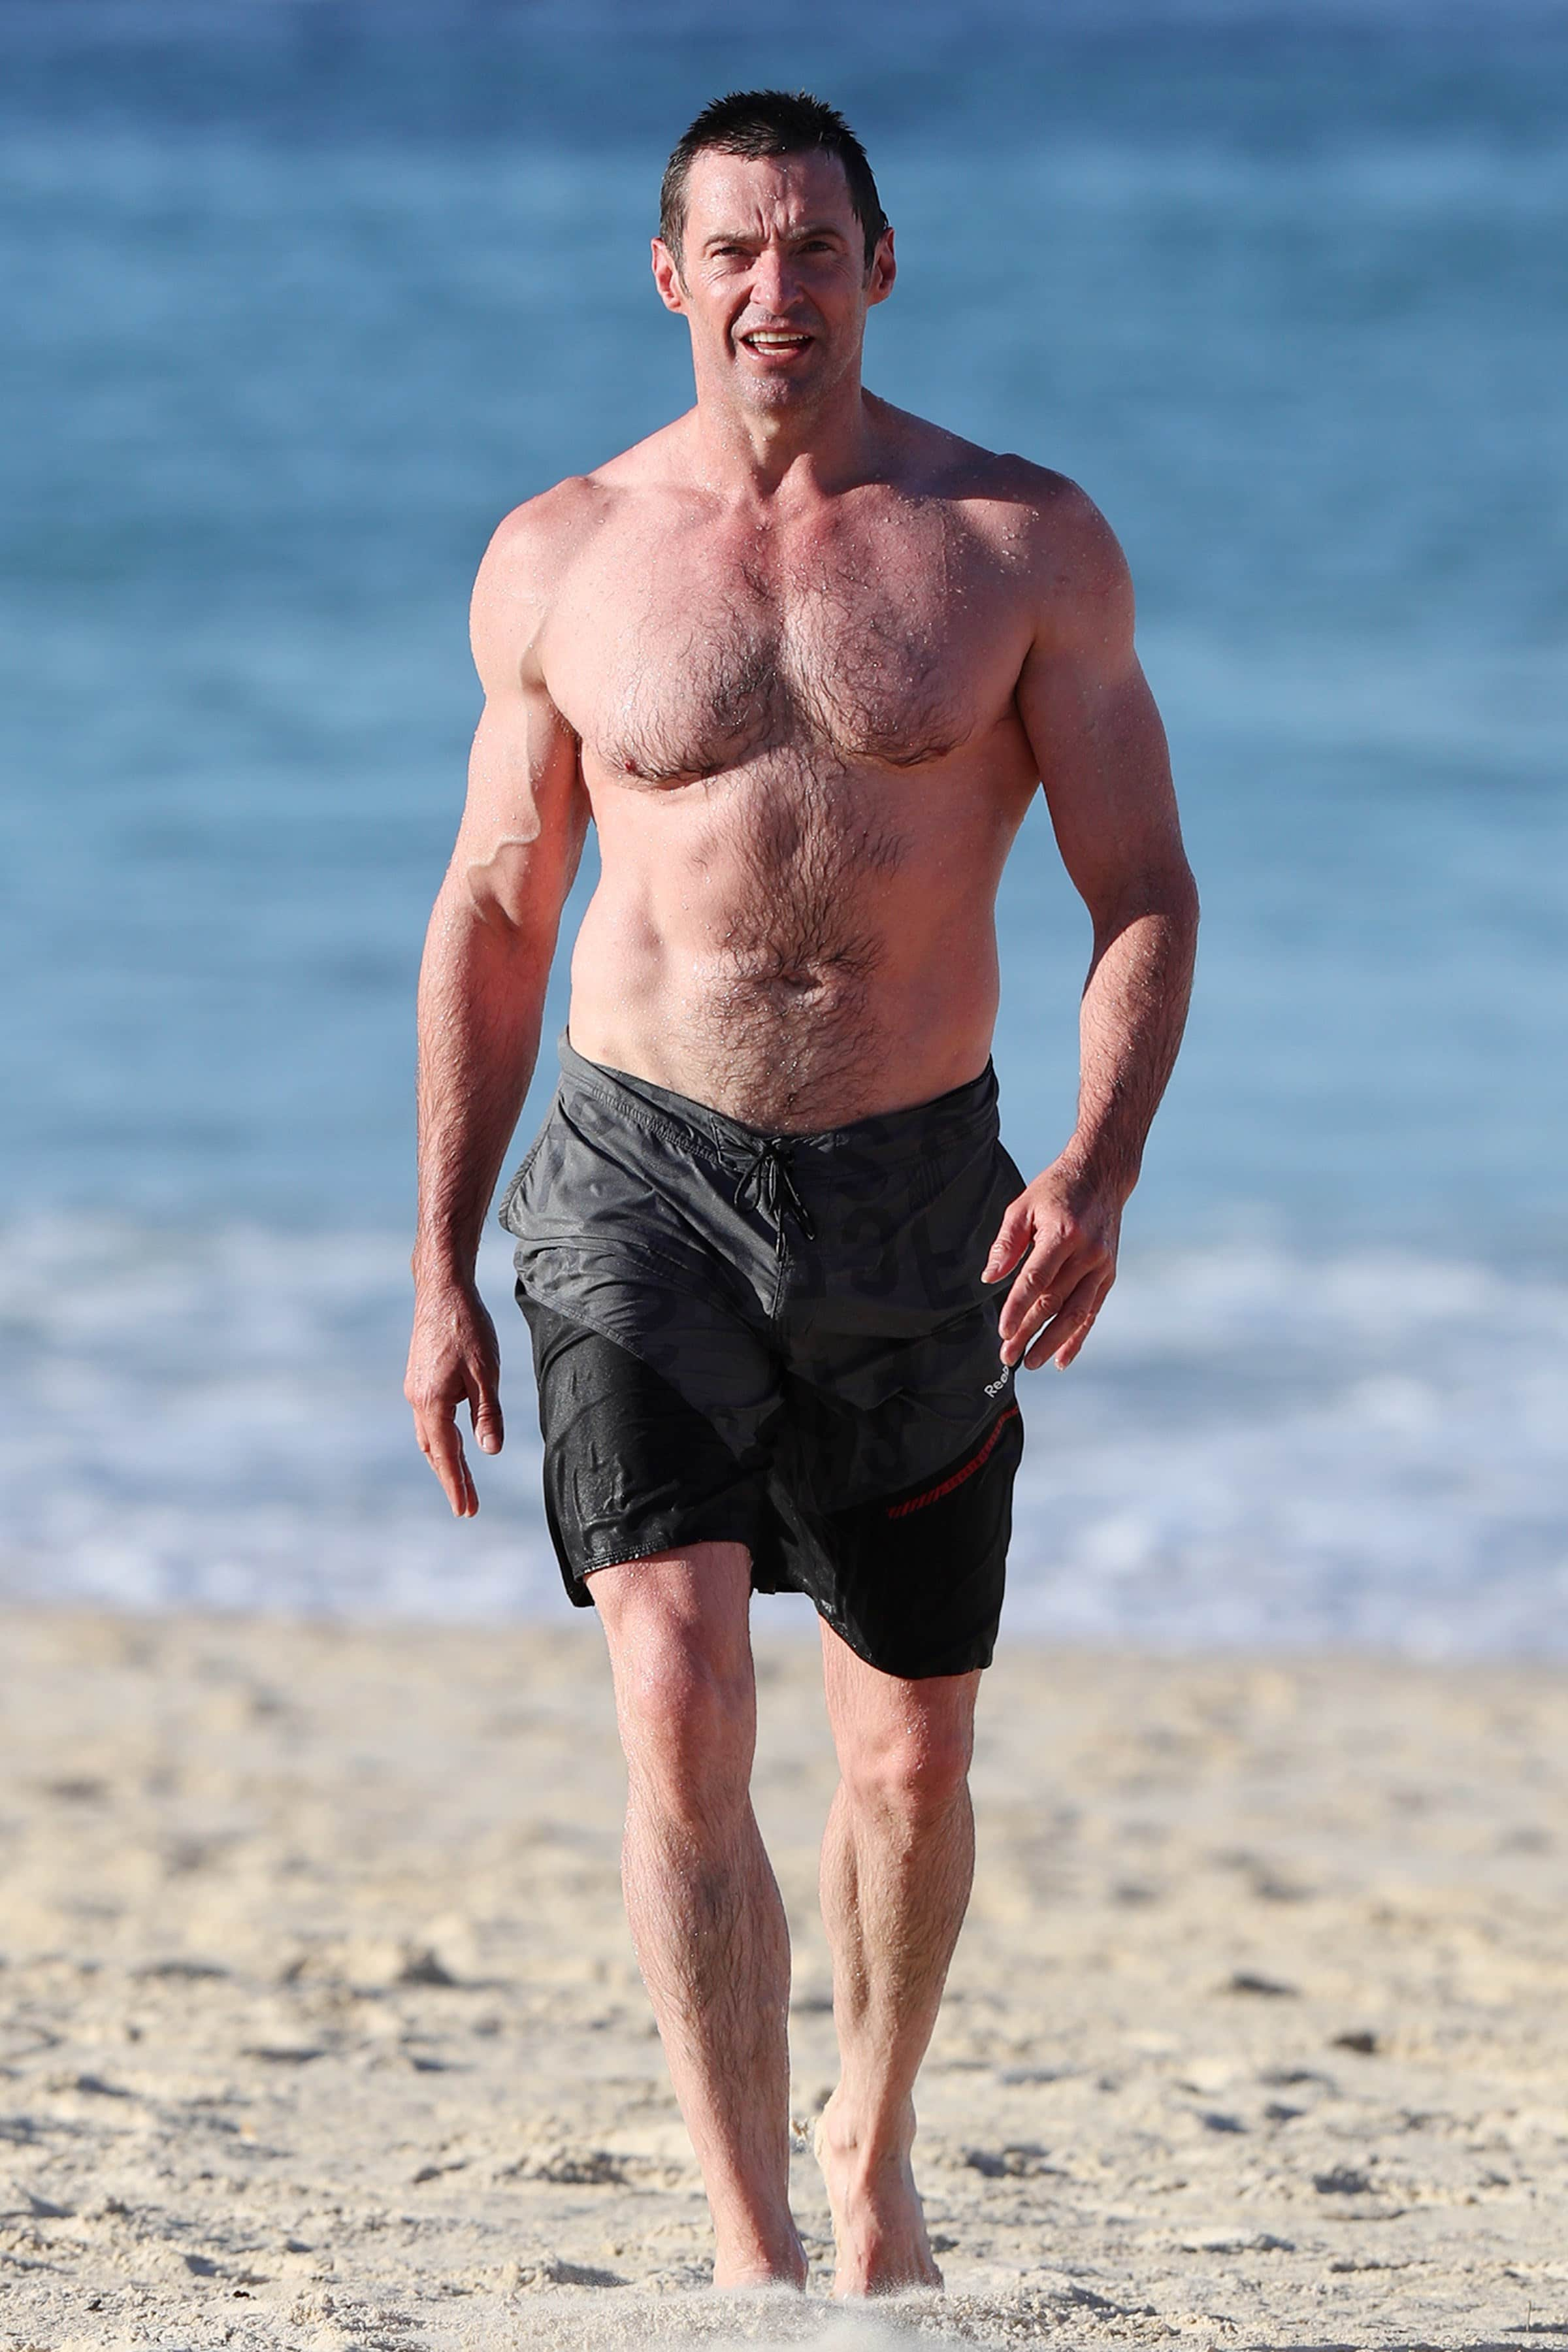 Hugh Jackman ripped